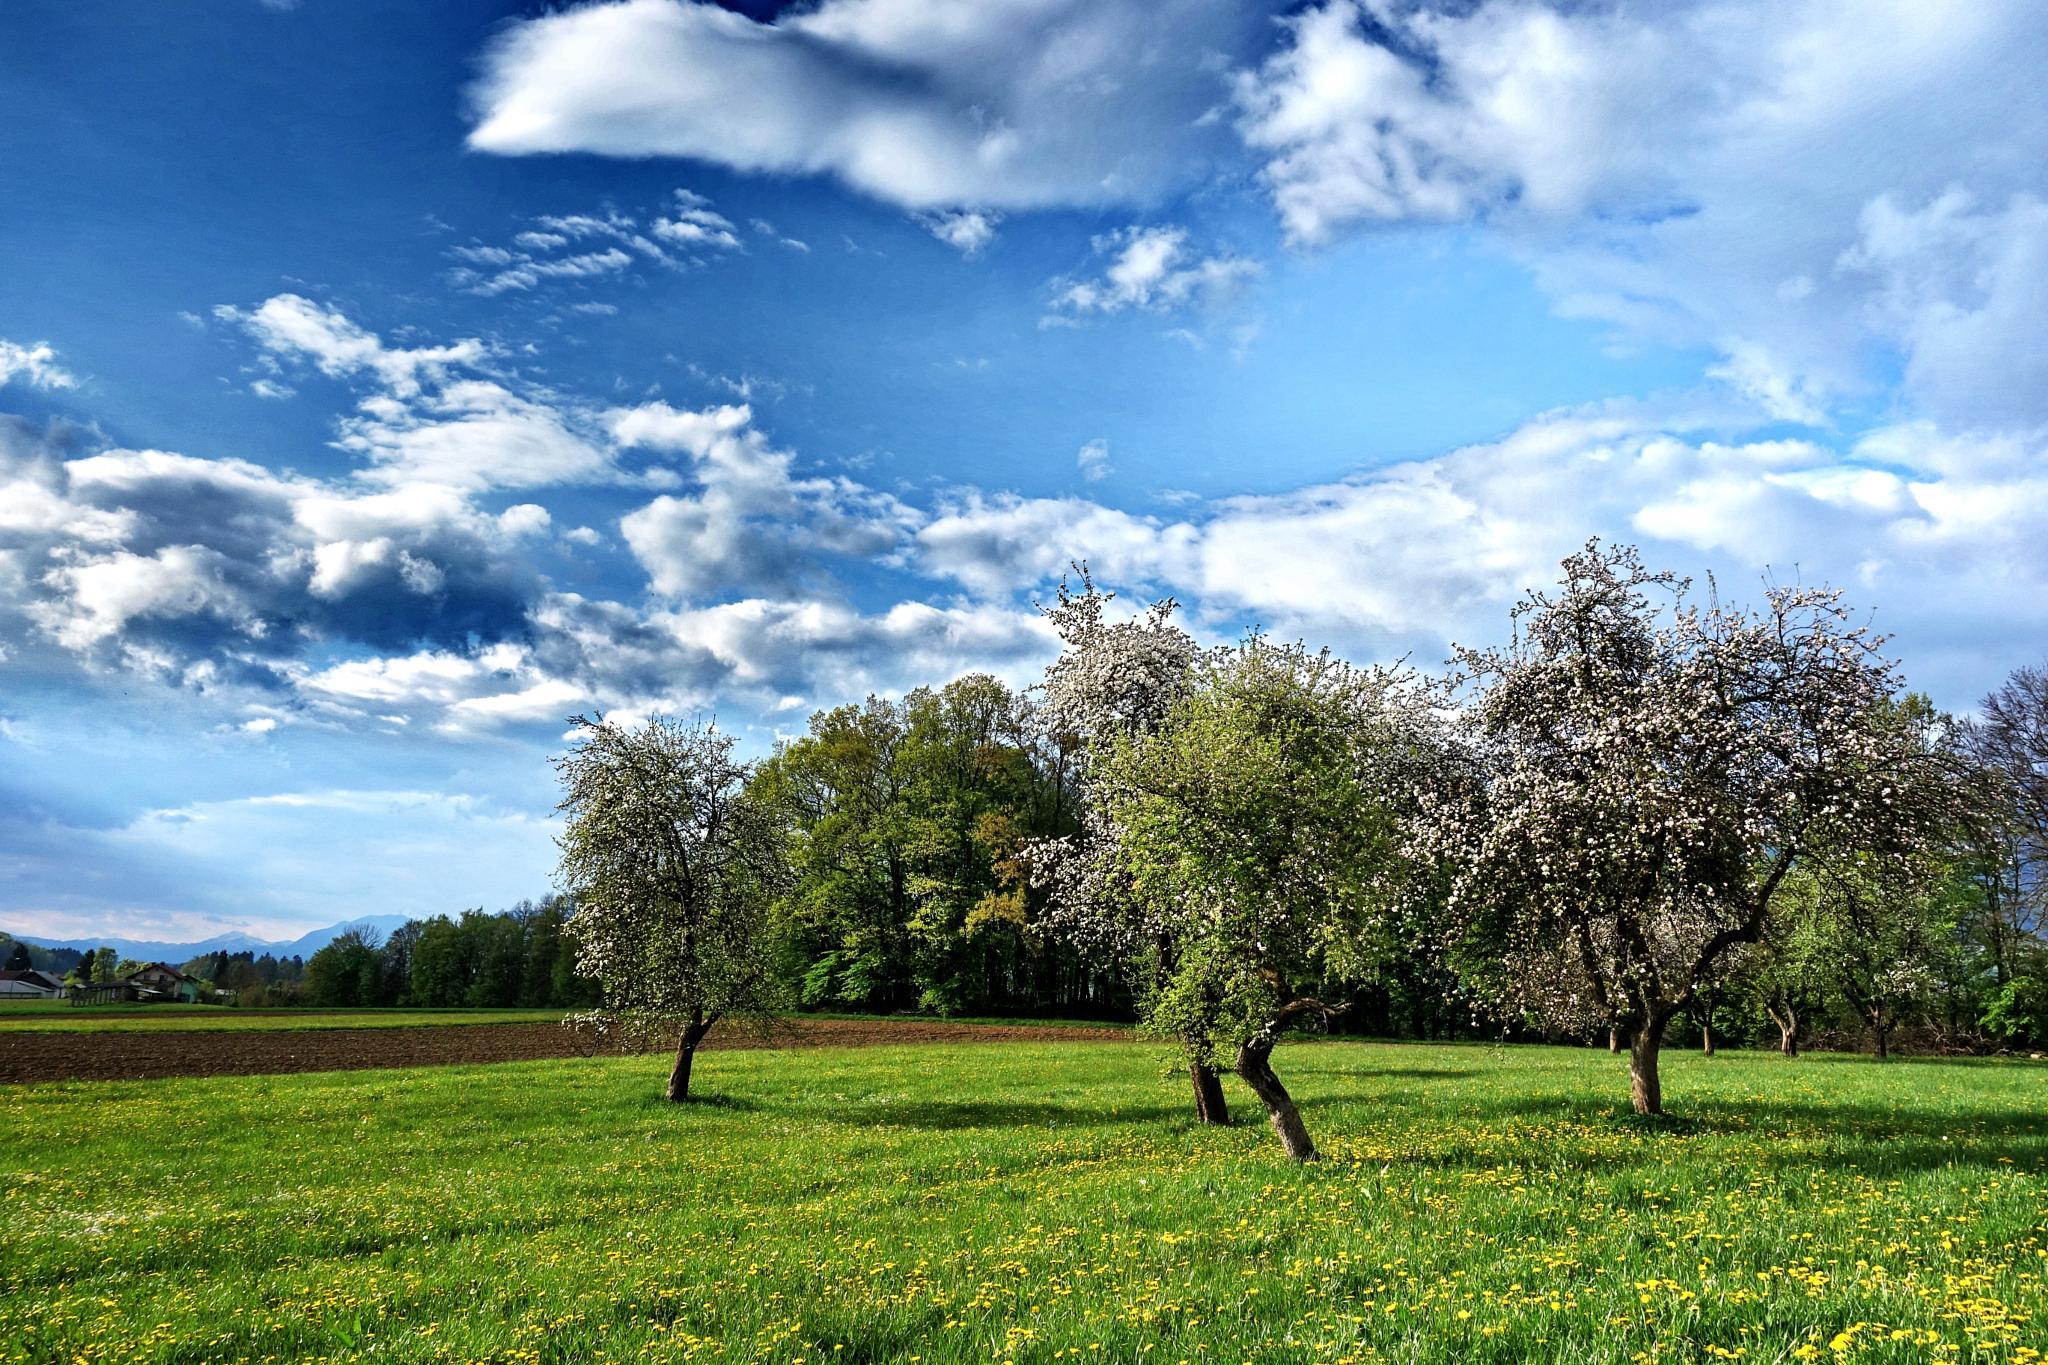 trees in blossom, spring in Gorenjska region by BernardaBizjak